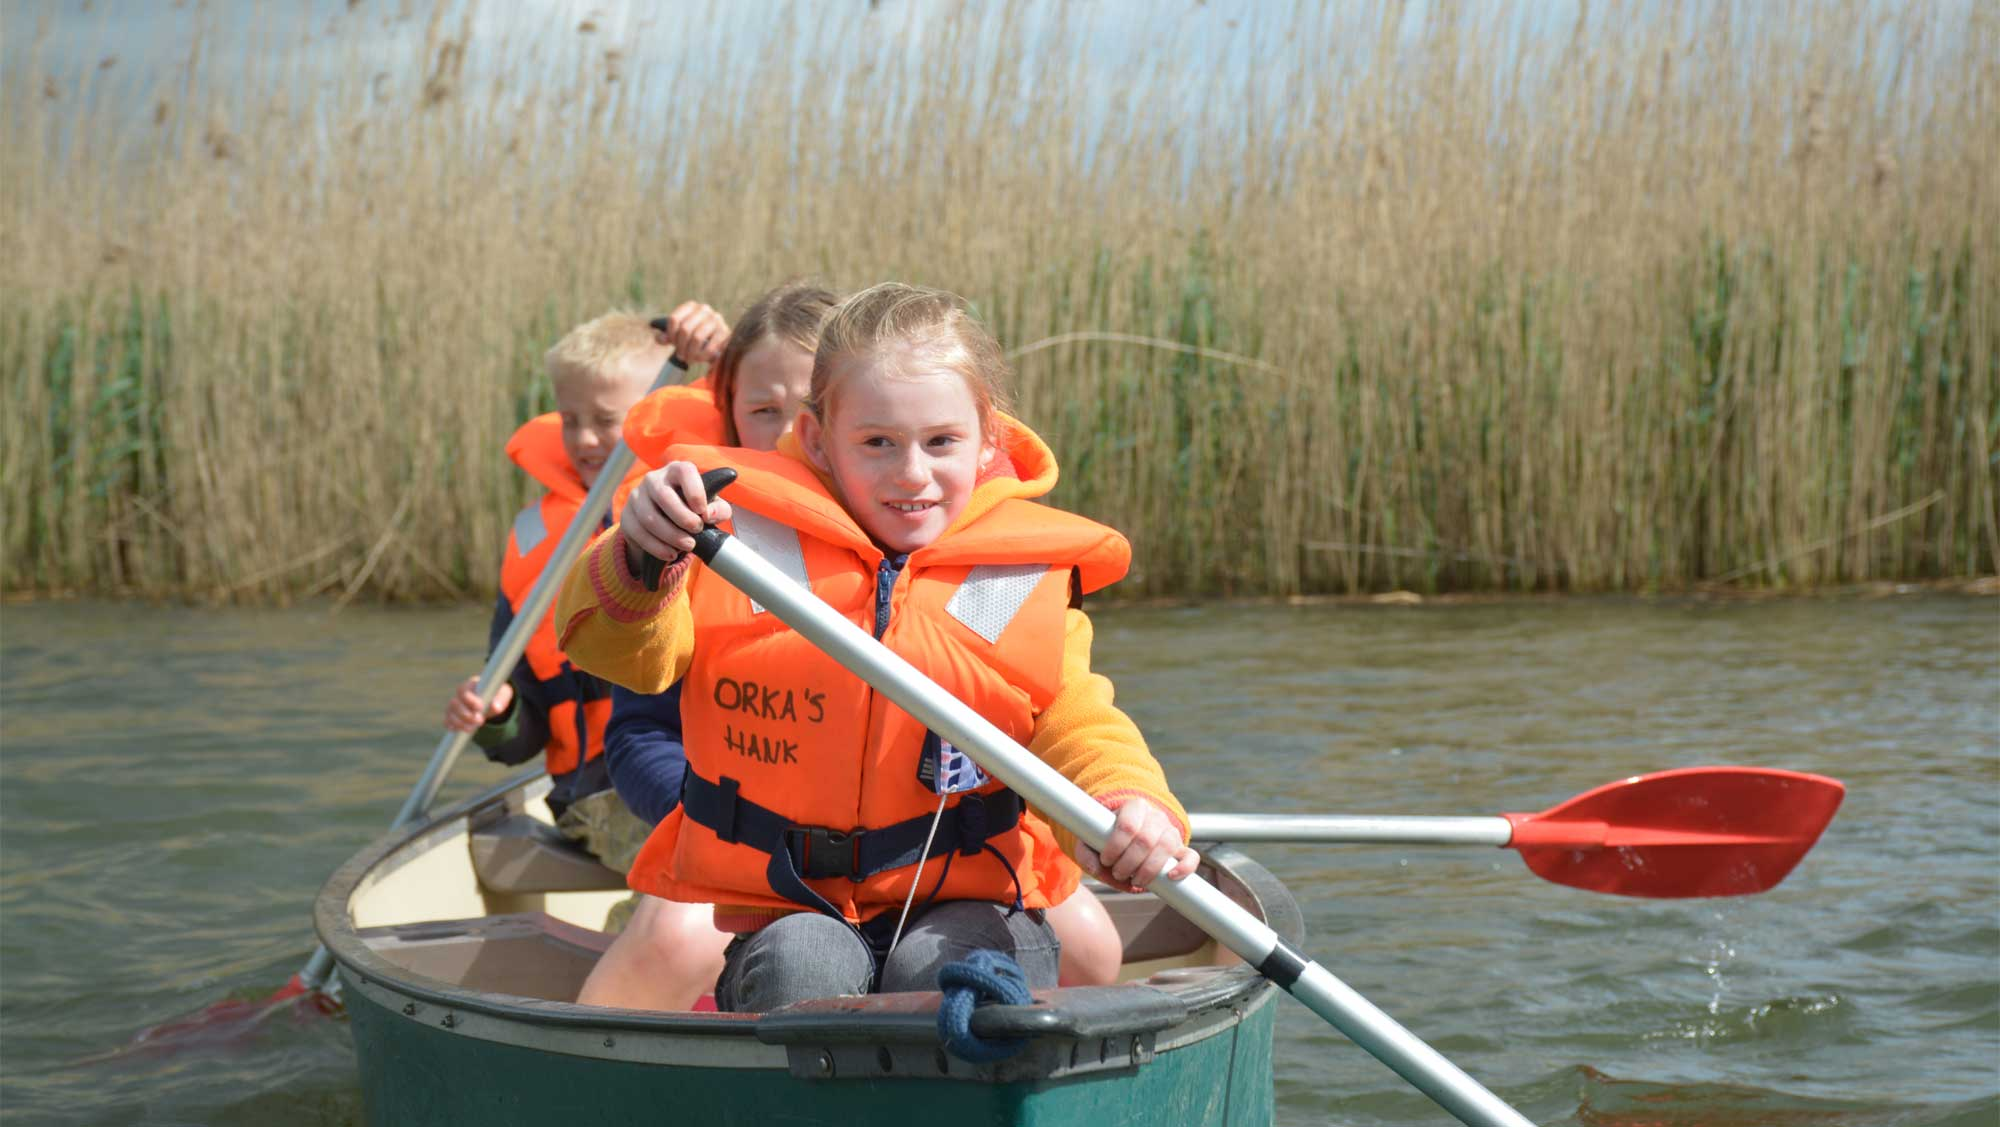 Omgeving Molecaten Park Bosbad Hoeven 05 kanoen Biesbosch